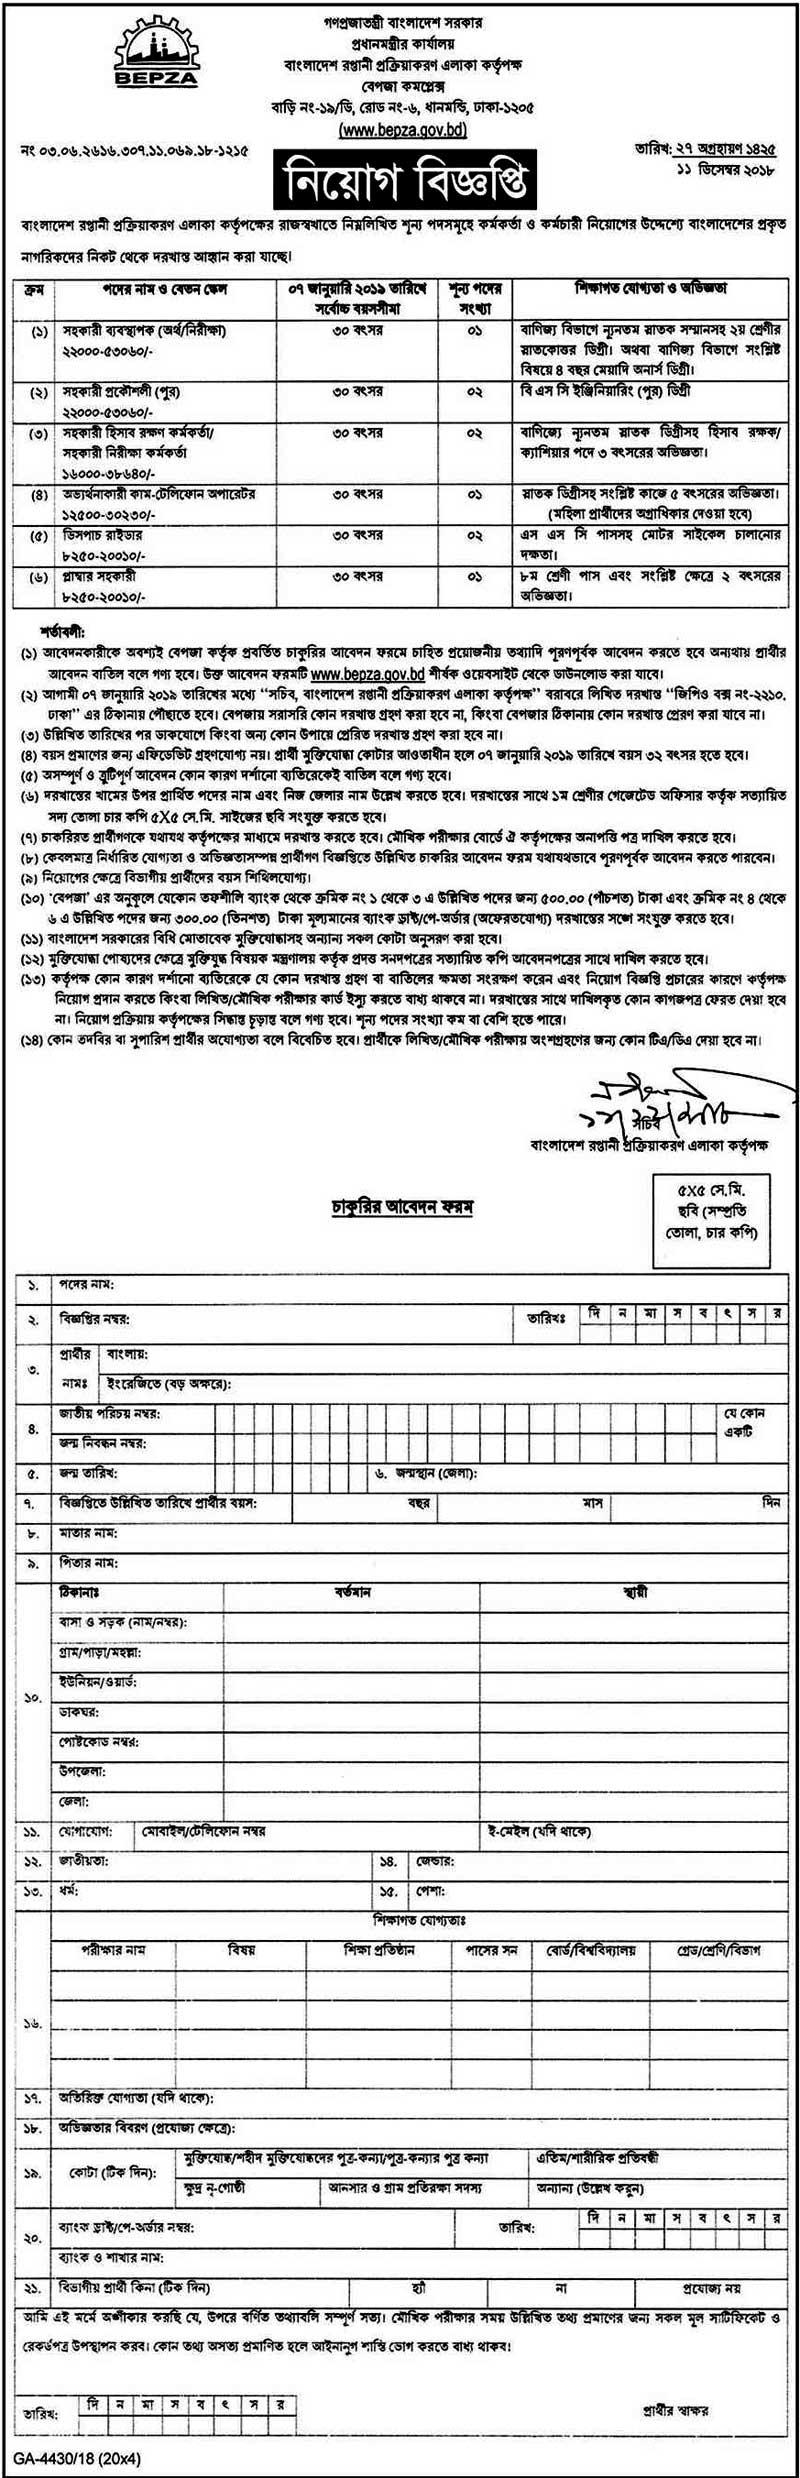 Prime Minister Office Job Circular 2018